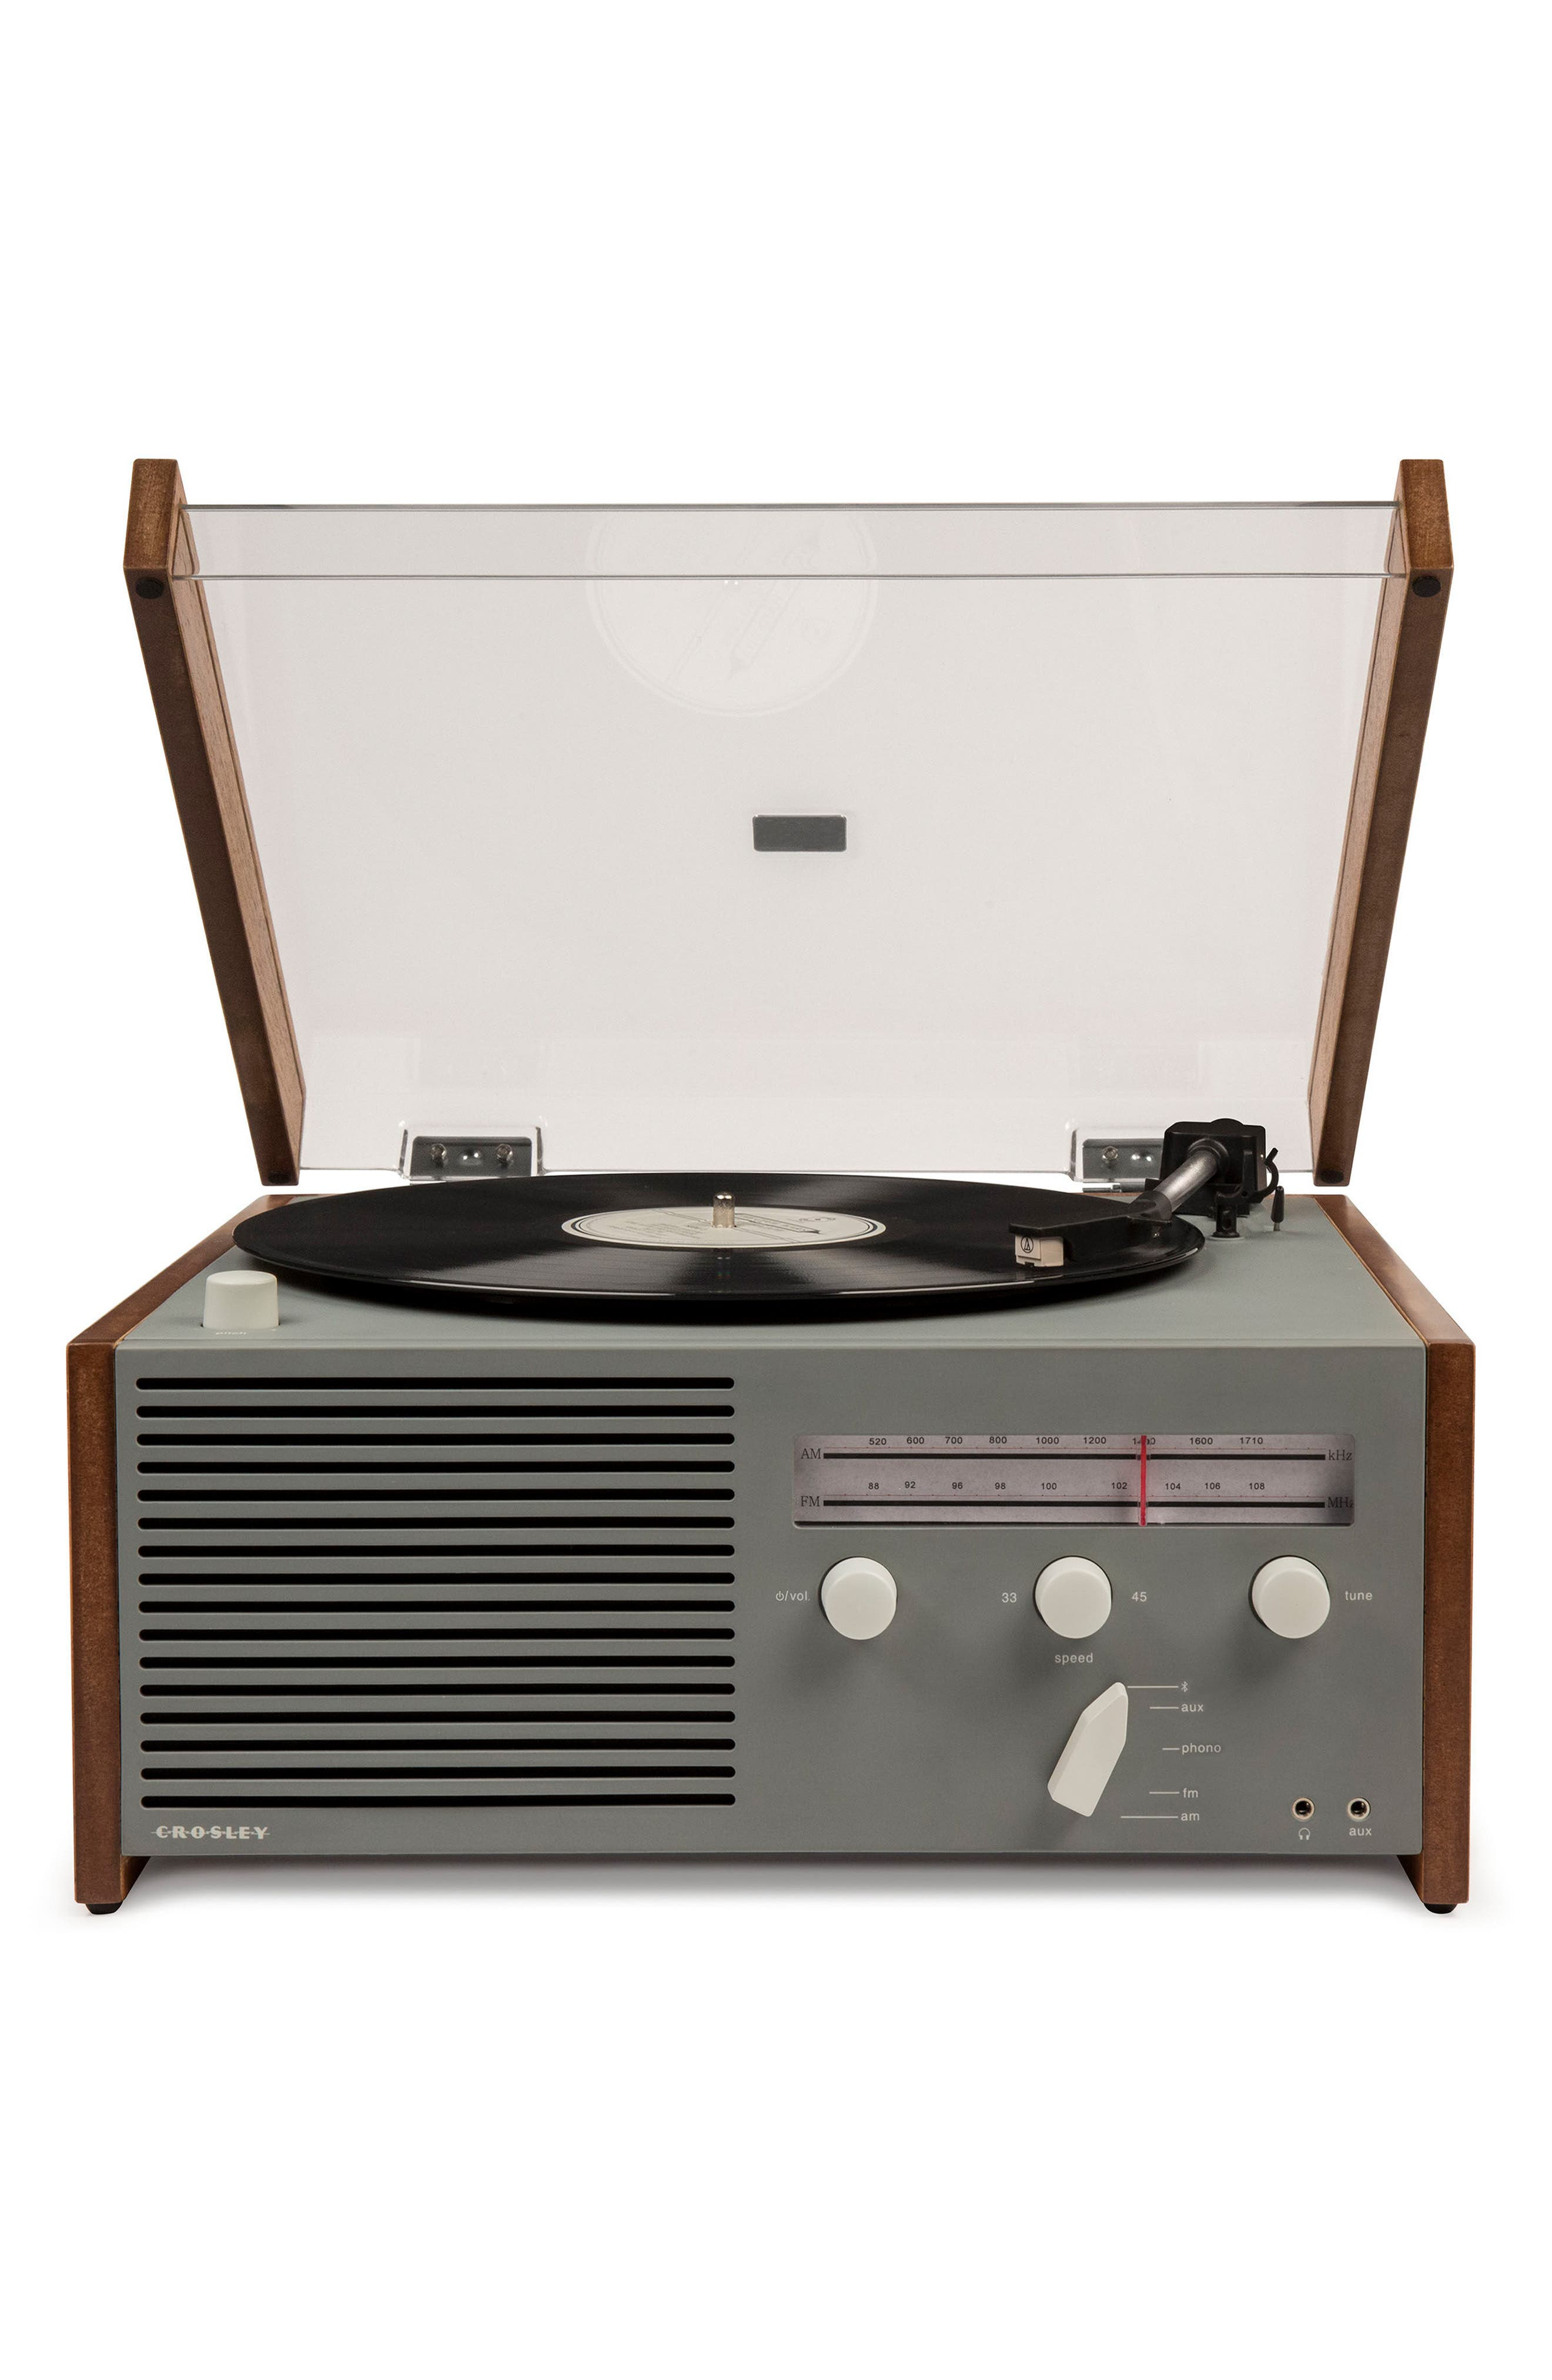 Main Image - Crosley Radio Otto 4-in-1 Turntable